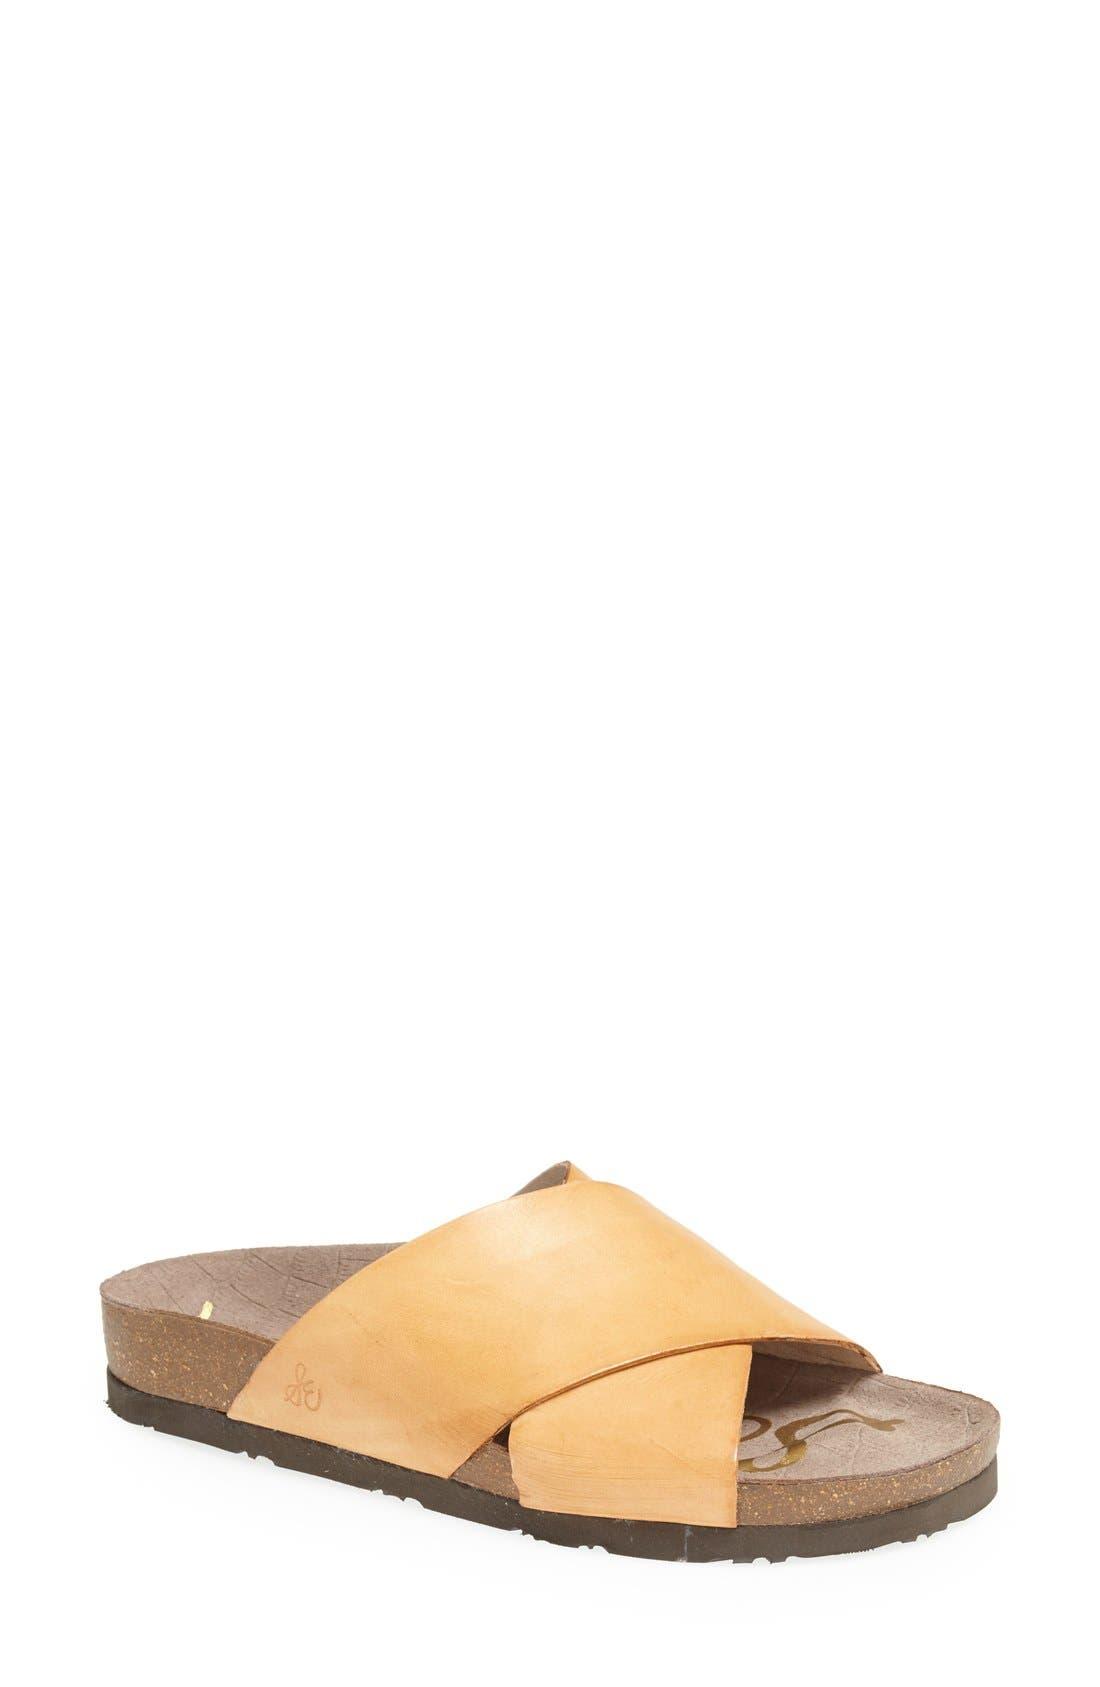 Main Image - Sam Edelman 'Adora' Sandal